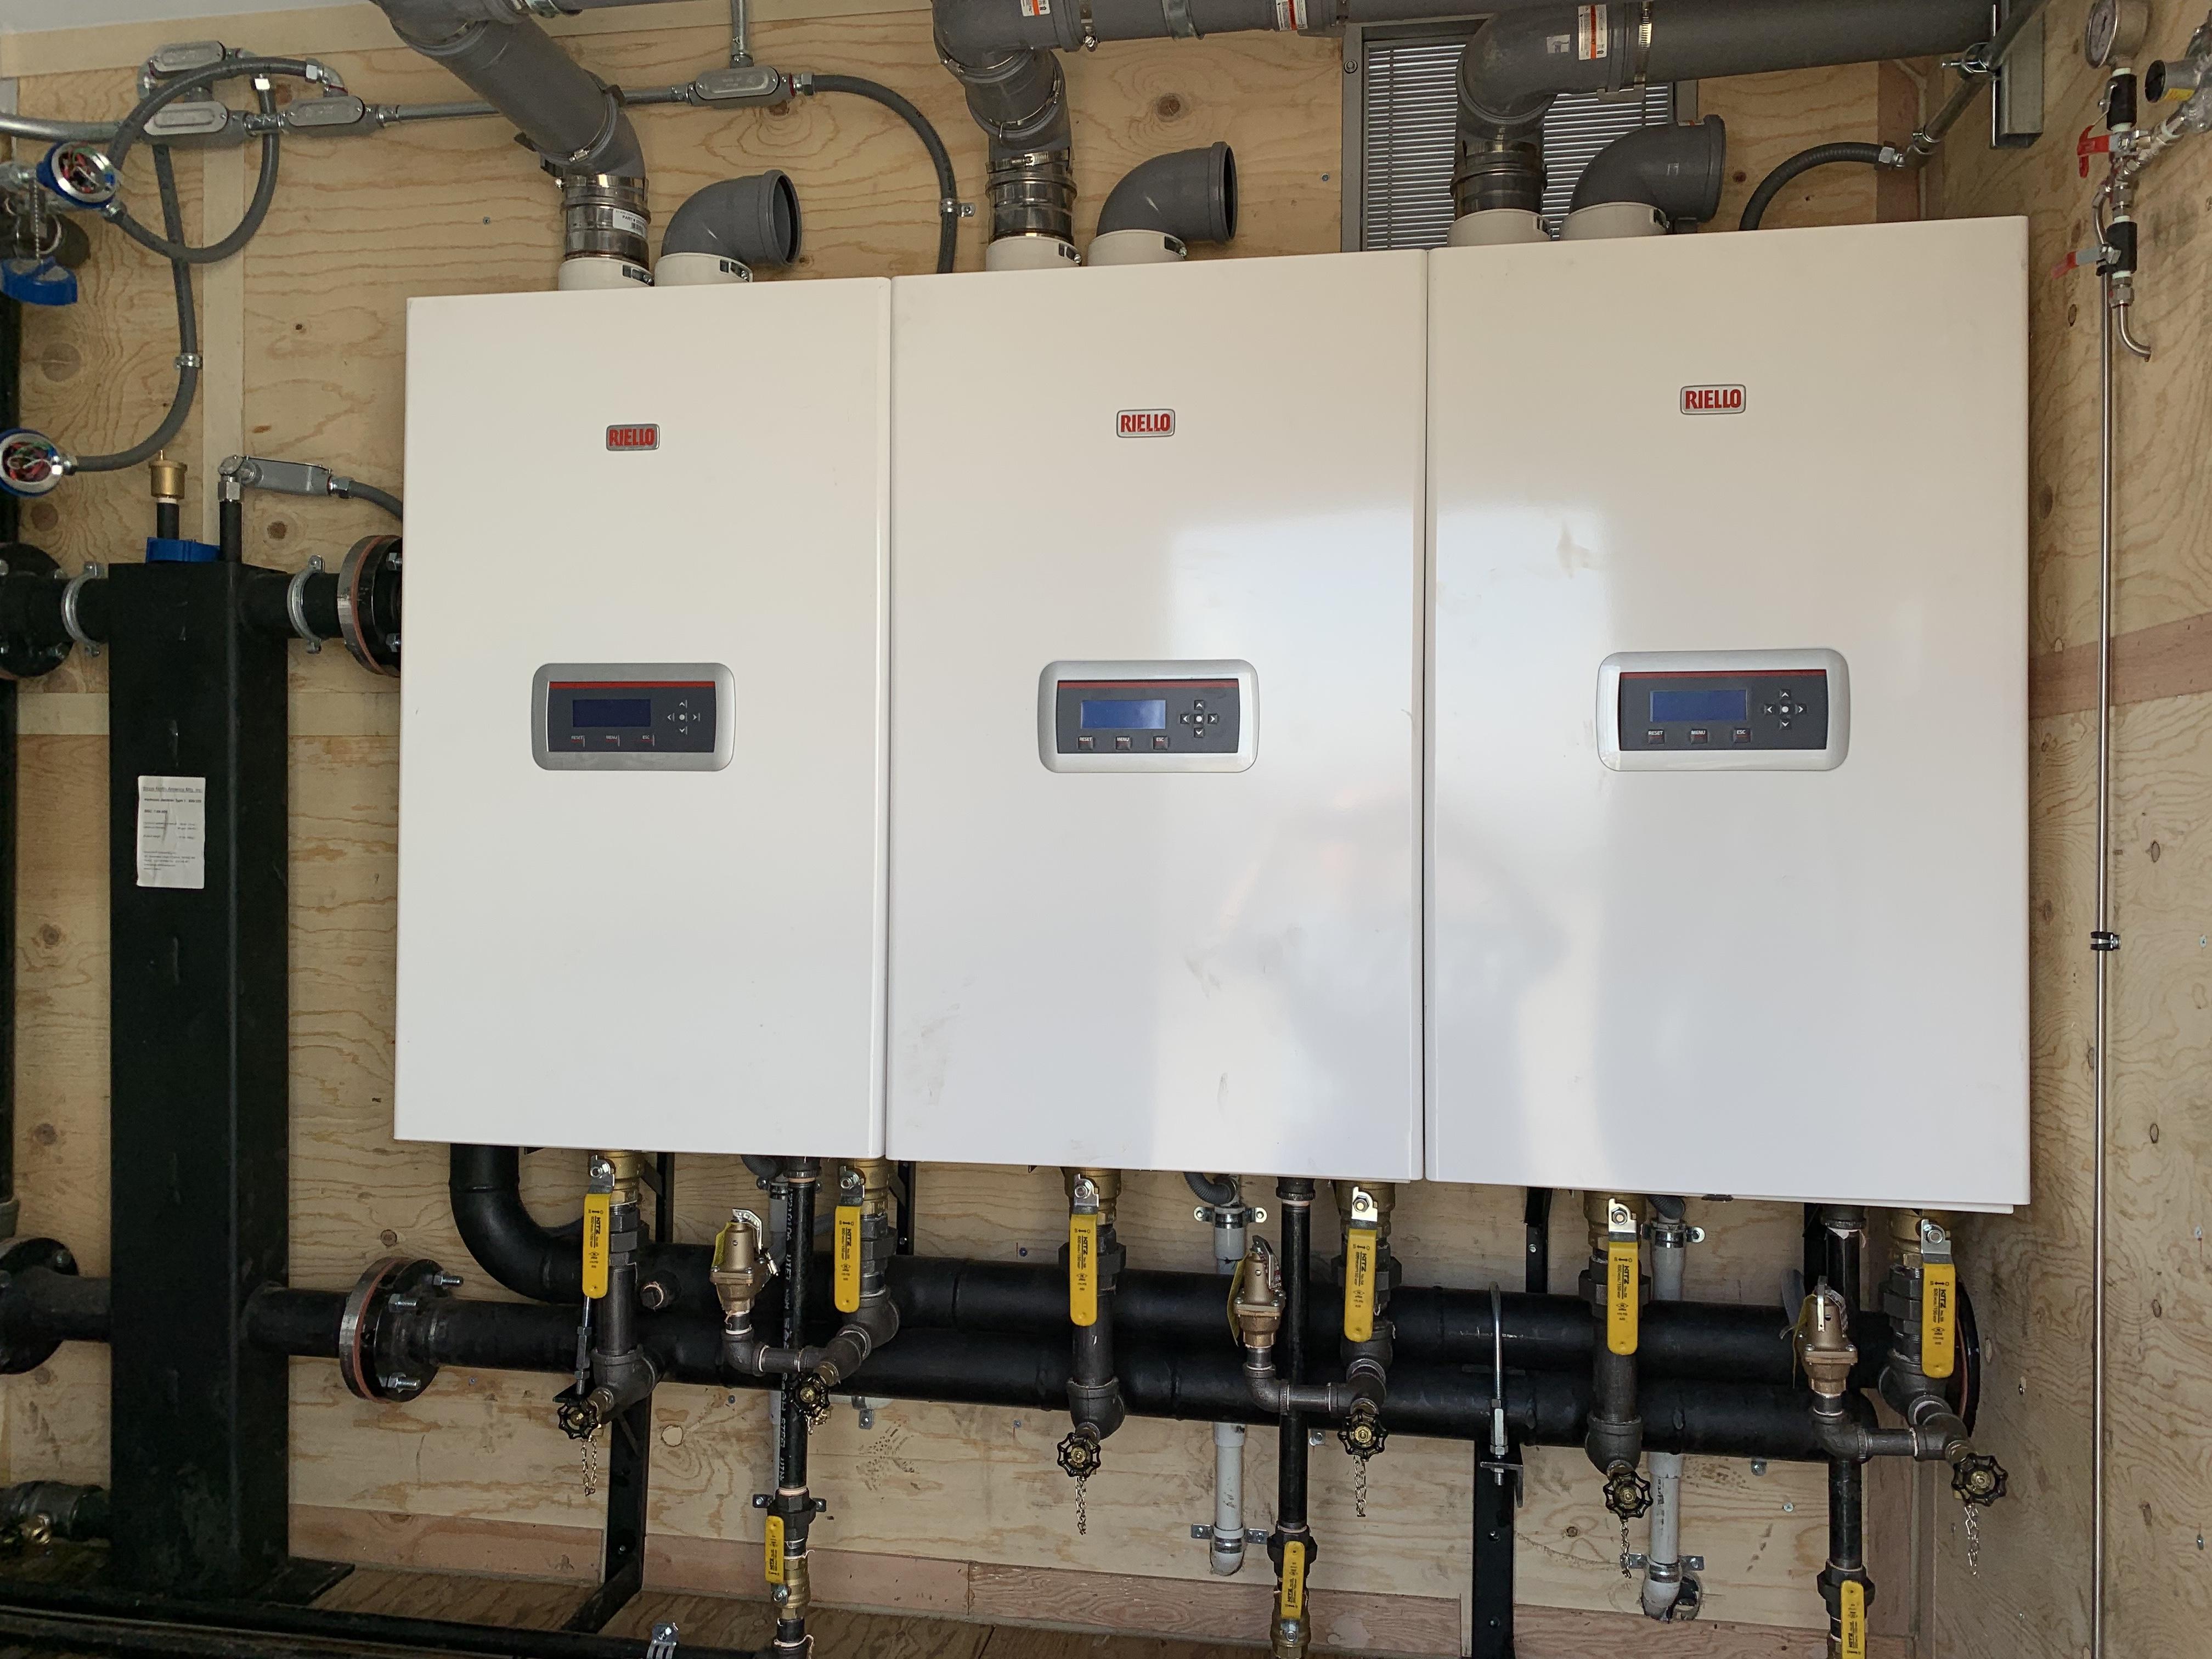 Riello Condexa PRO- 399,000Btu Wall Hung Boiler cascade, 1,200,000 Btu Boiler Plant with 30:1 Turndown